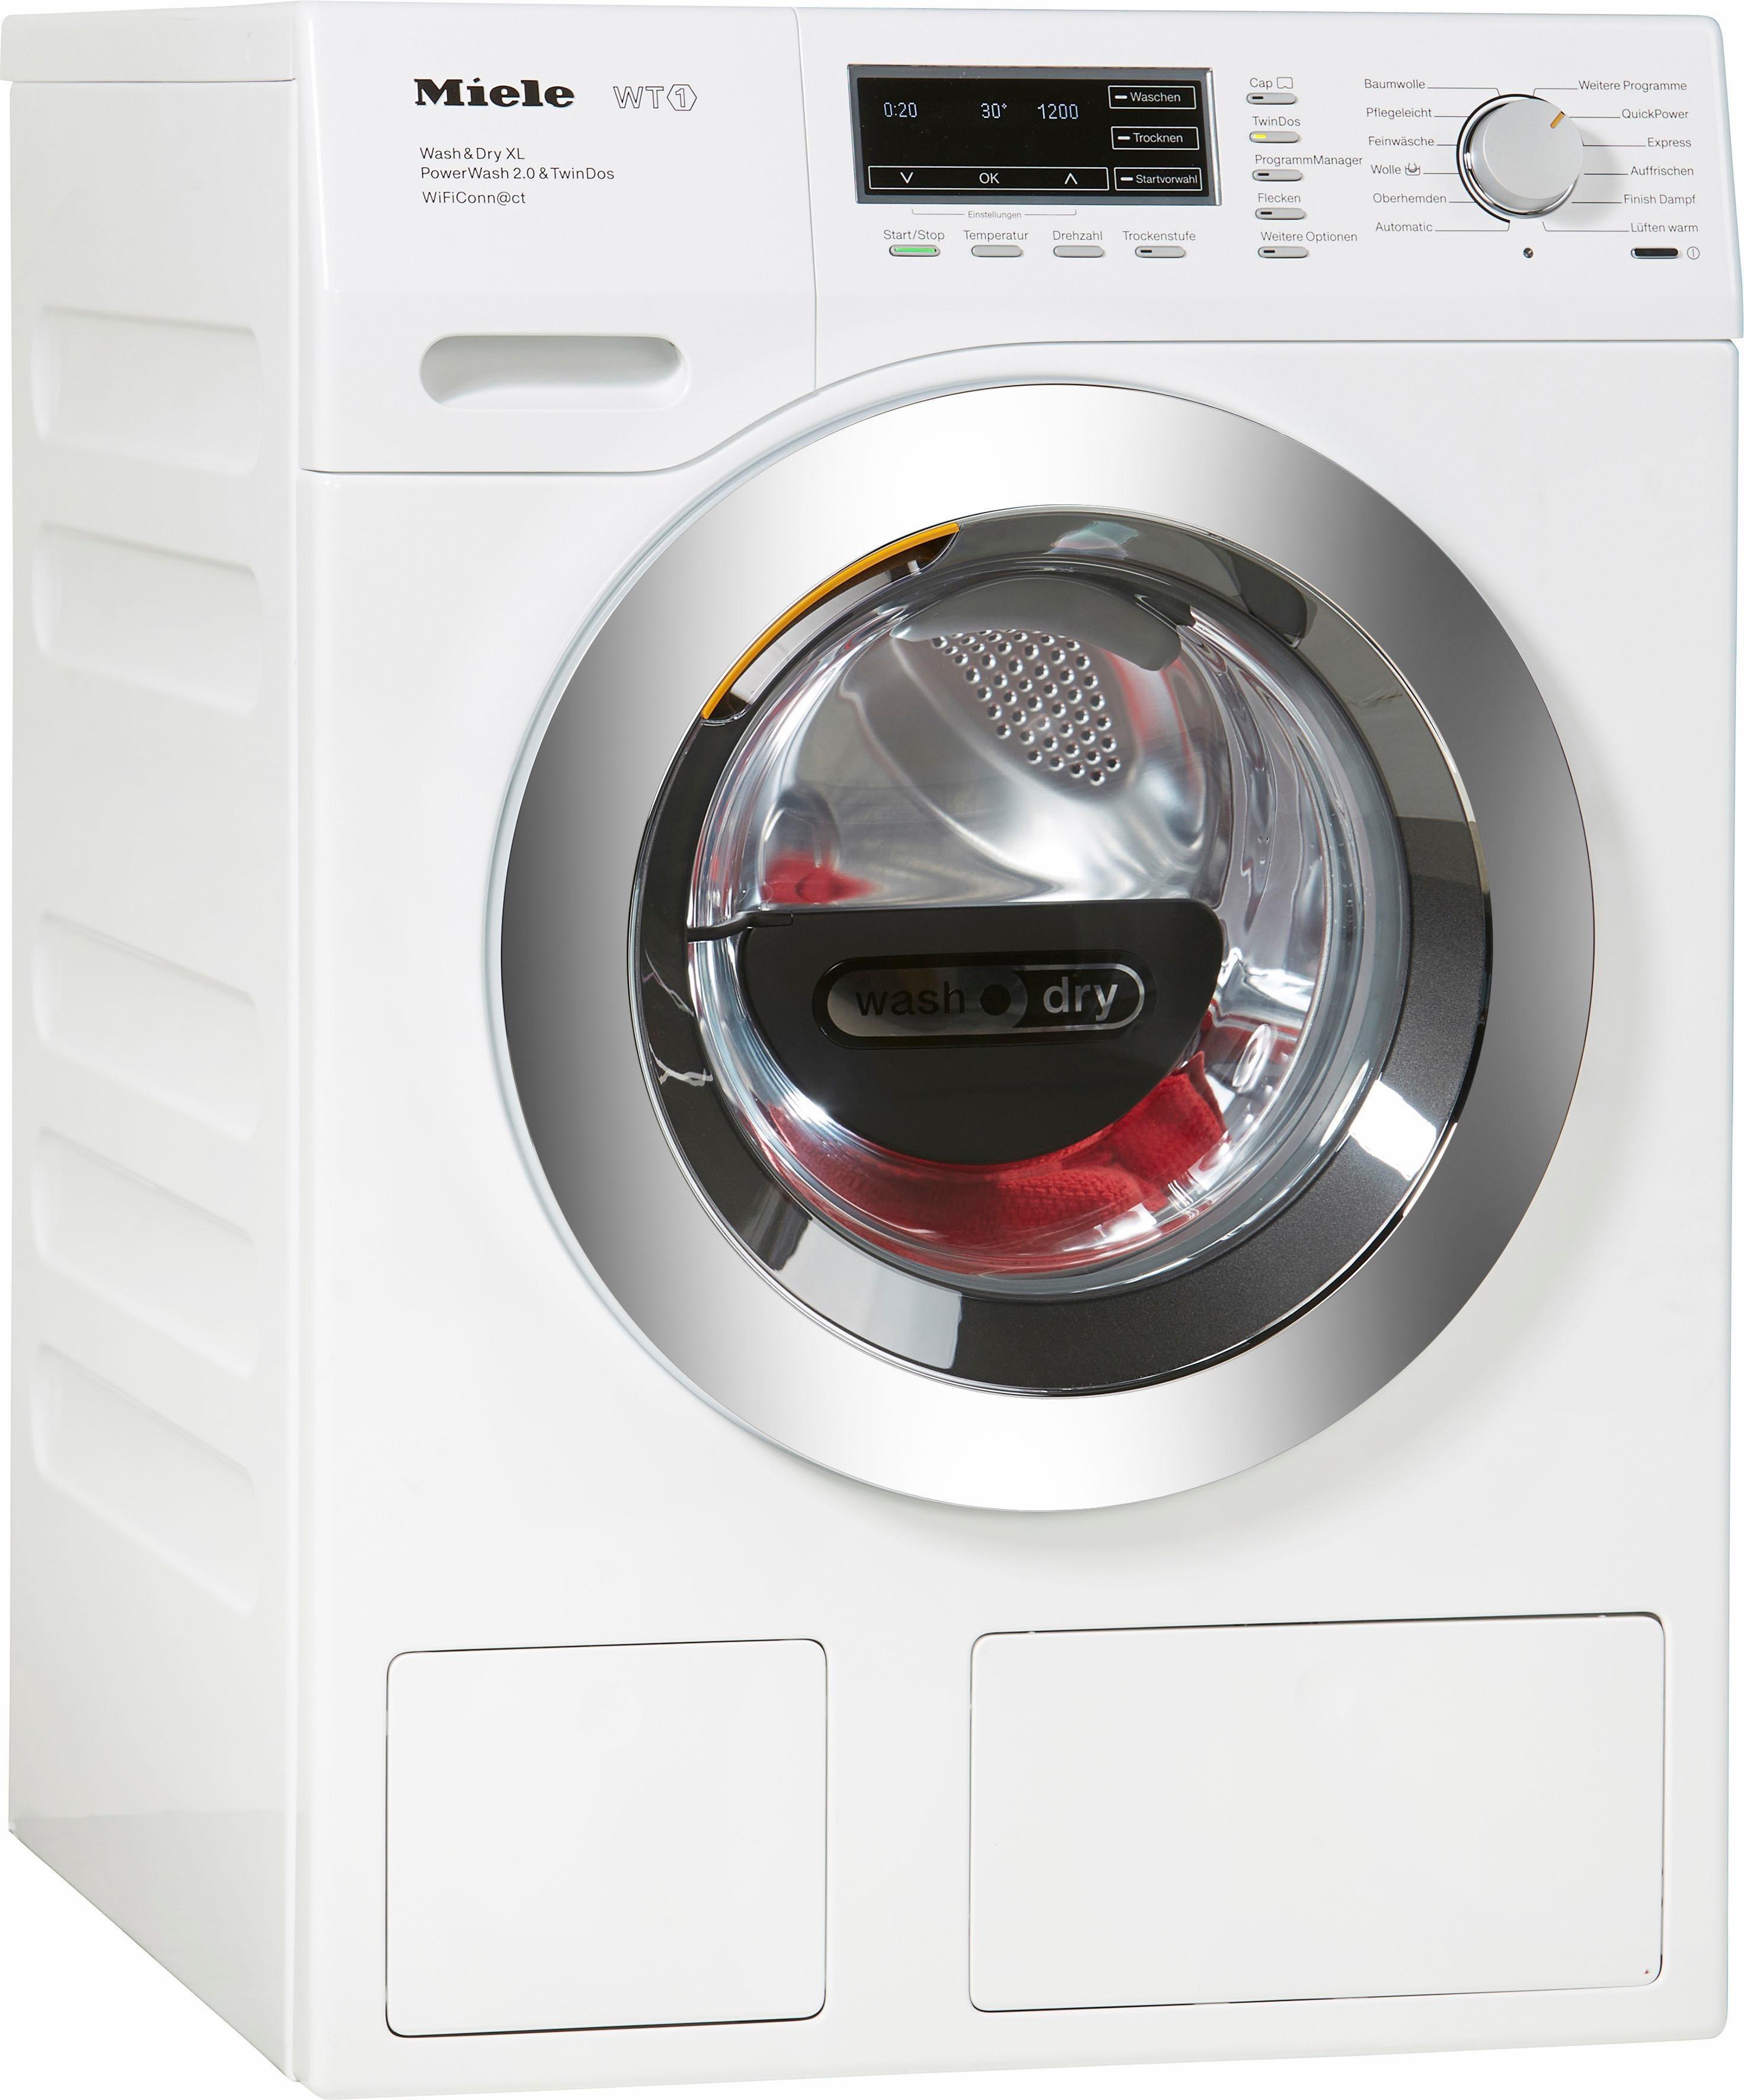 Miele Waschtrockner WTZH730WPM PWash2.0&TDosXL Wif D, 8 kg/5 kg, 1600 U/Min